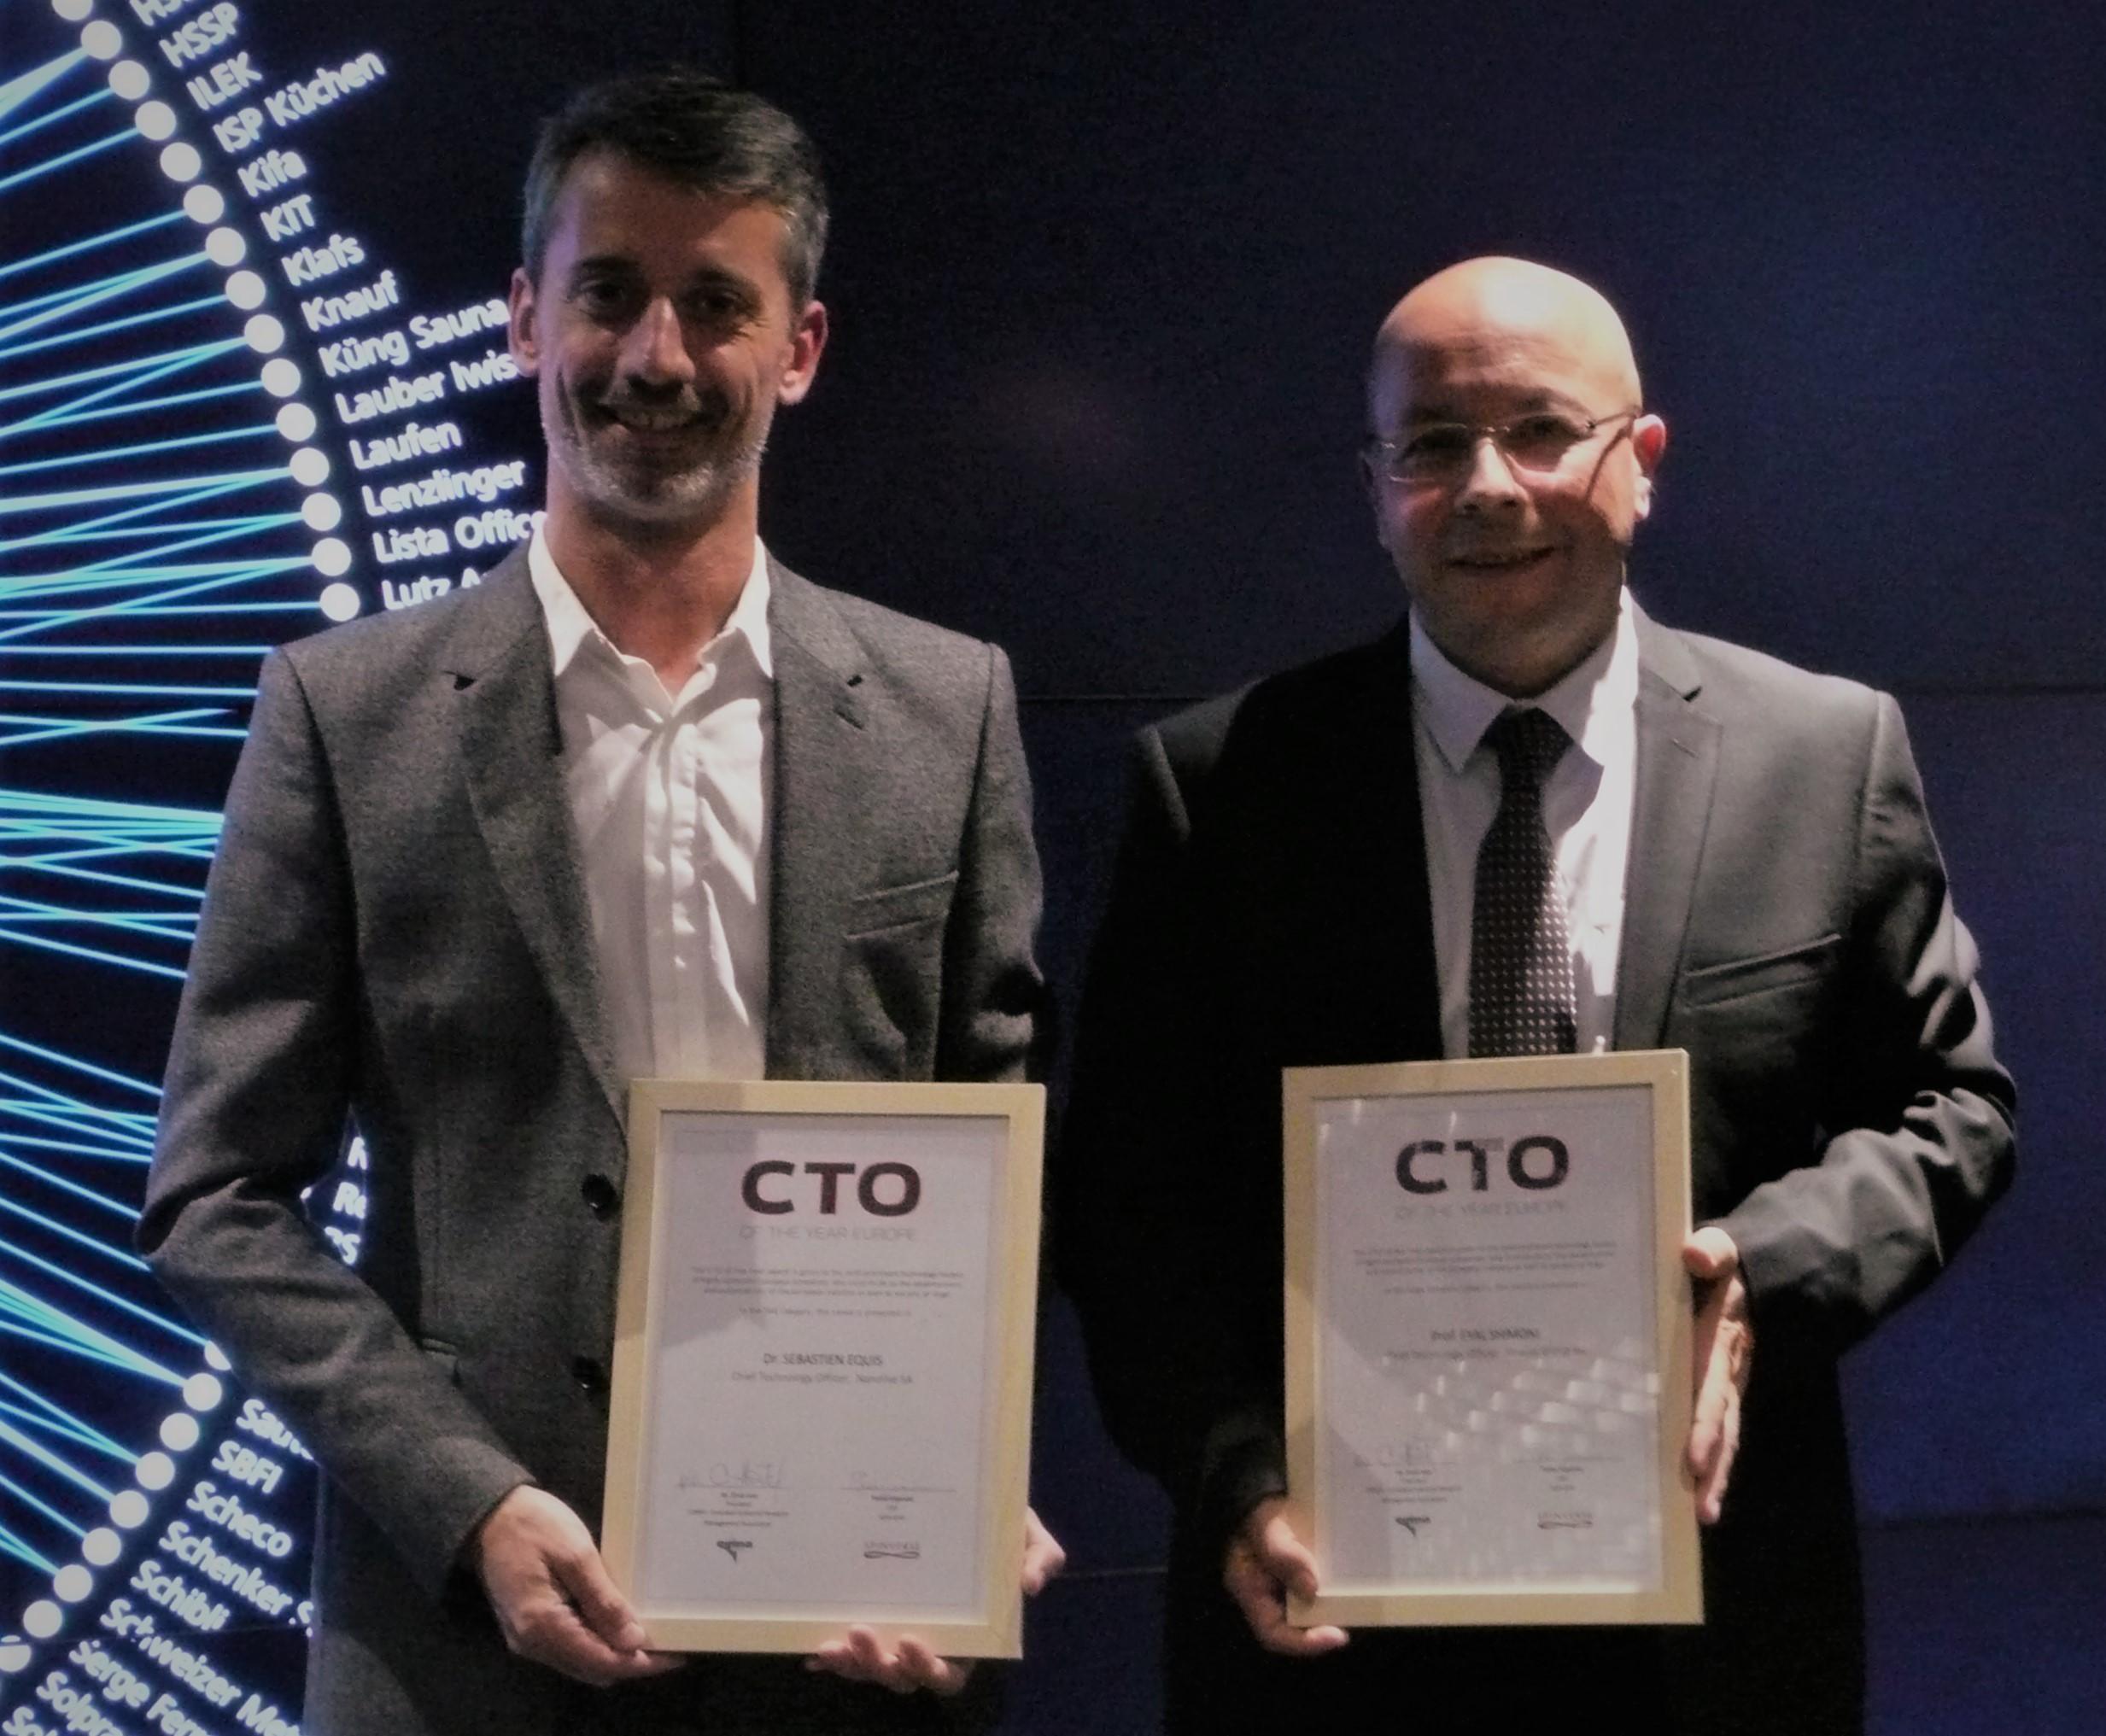 Sebastien Equis (European CTO of the Year 2017, Nanolive) and Eyal Shimoni (European CTO of the Year 2017, Strauss Group)